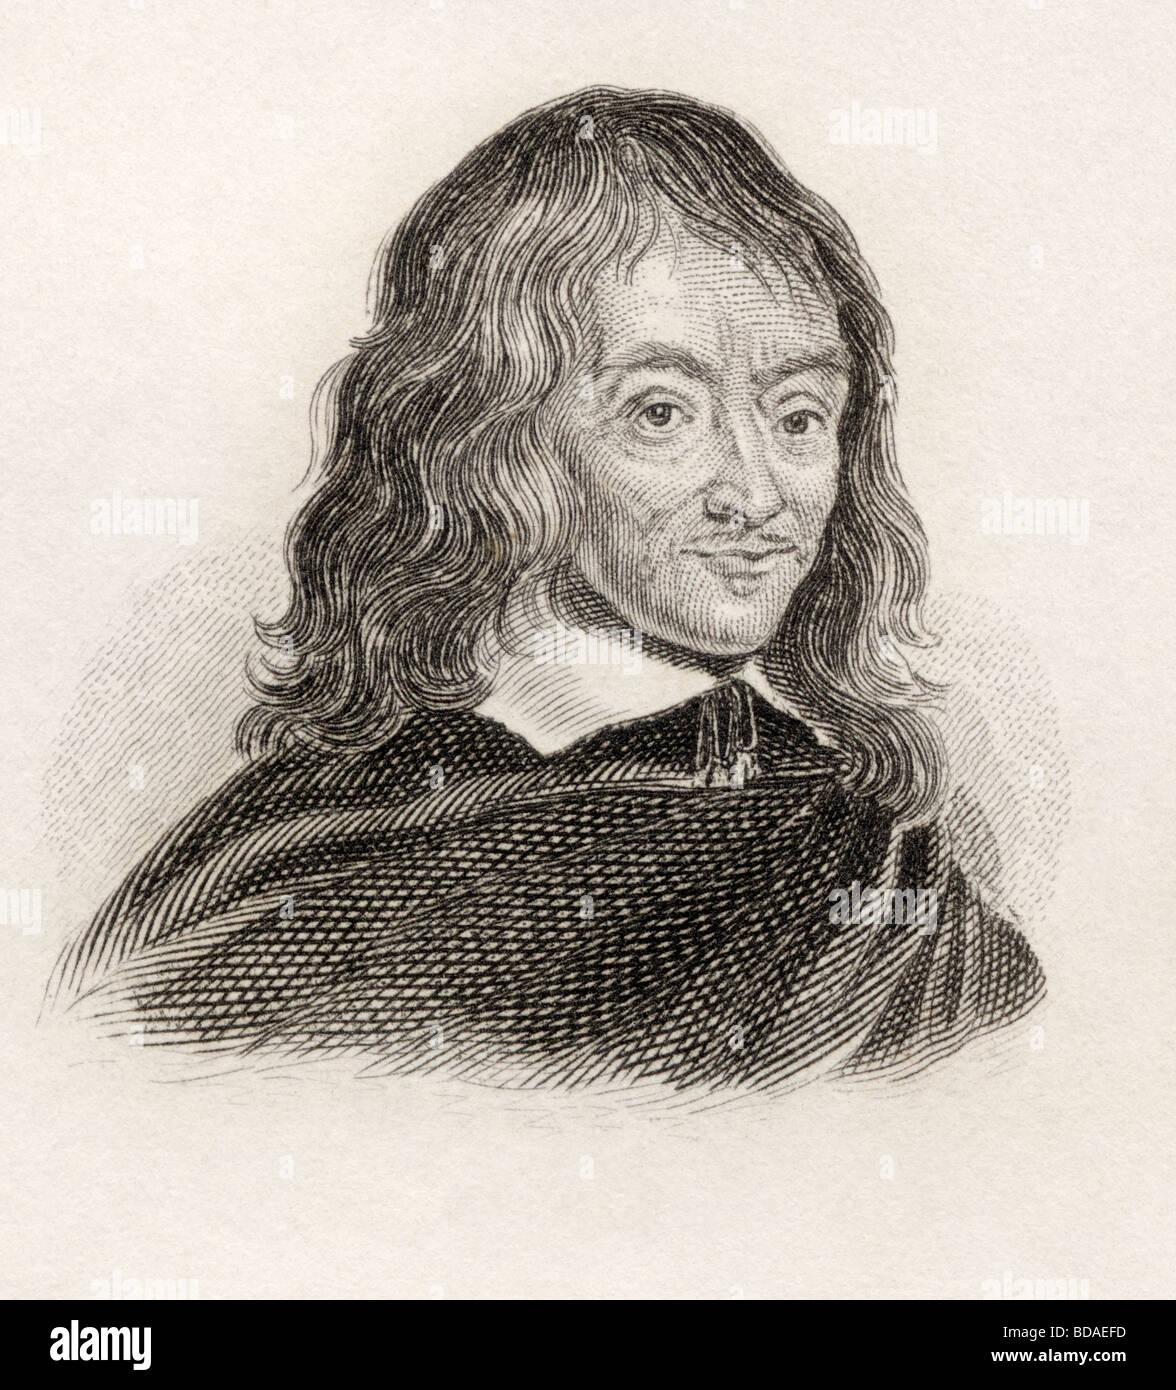 Claudius Salmasius aka Claude Saumaise 1588 to 1653.  French classical scholar. - Stock Image